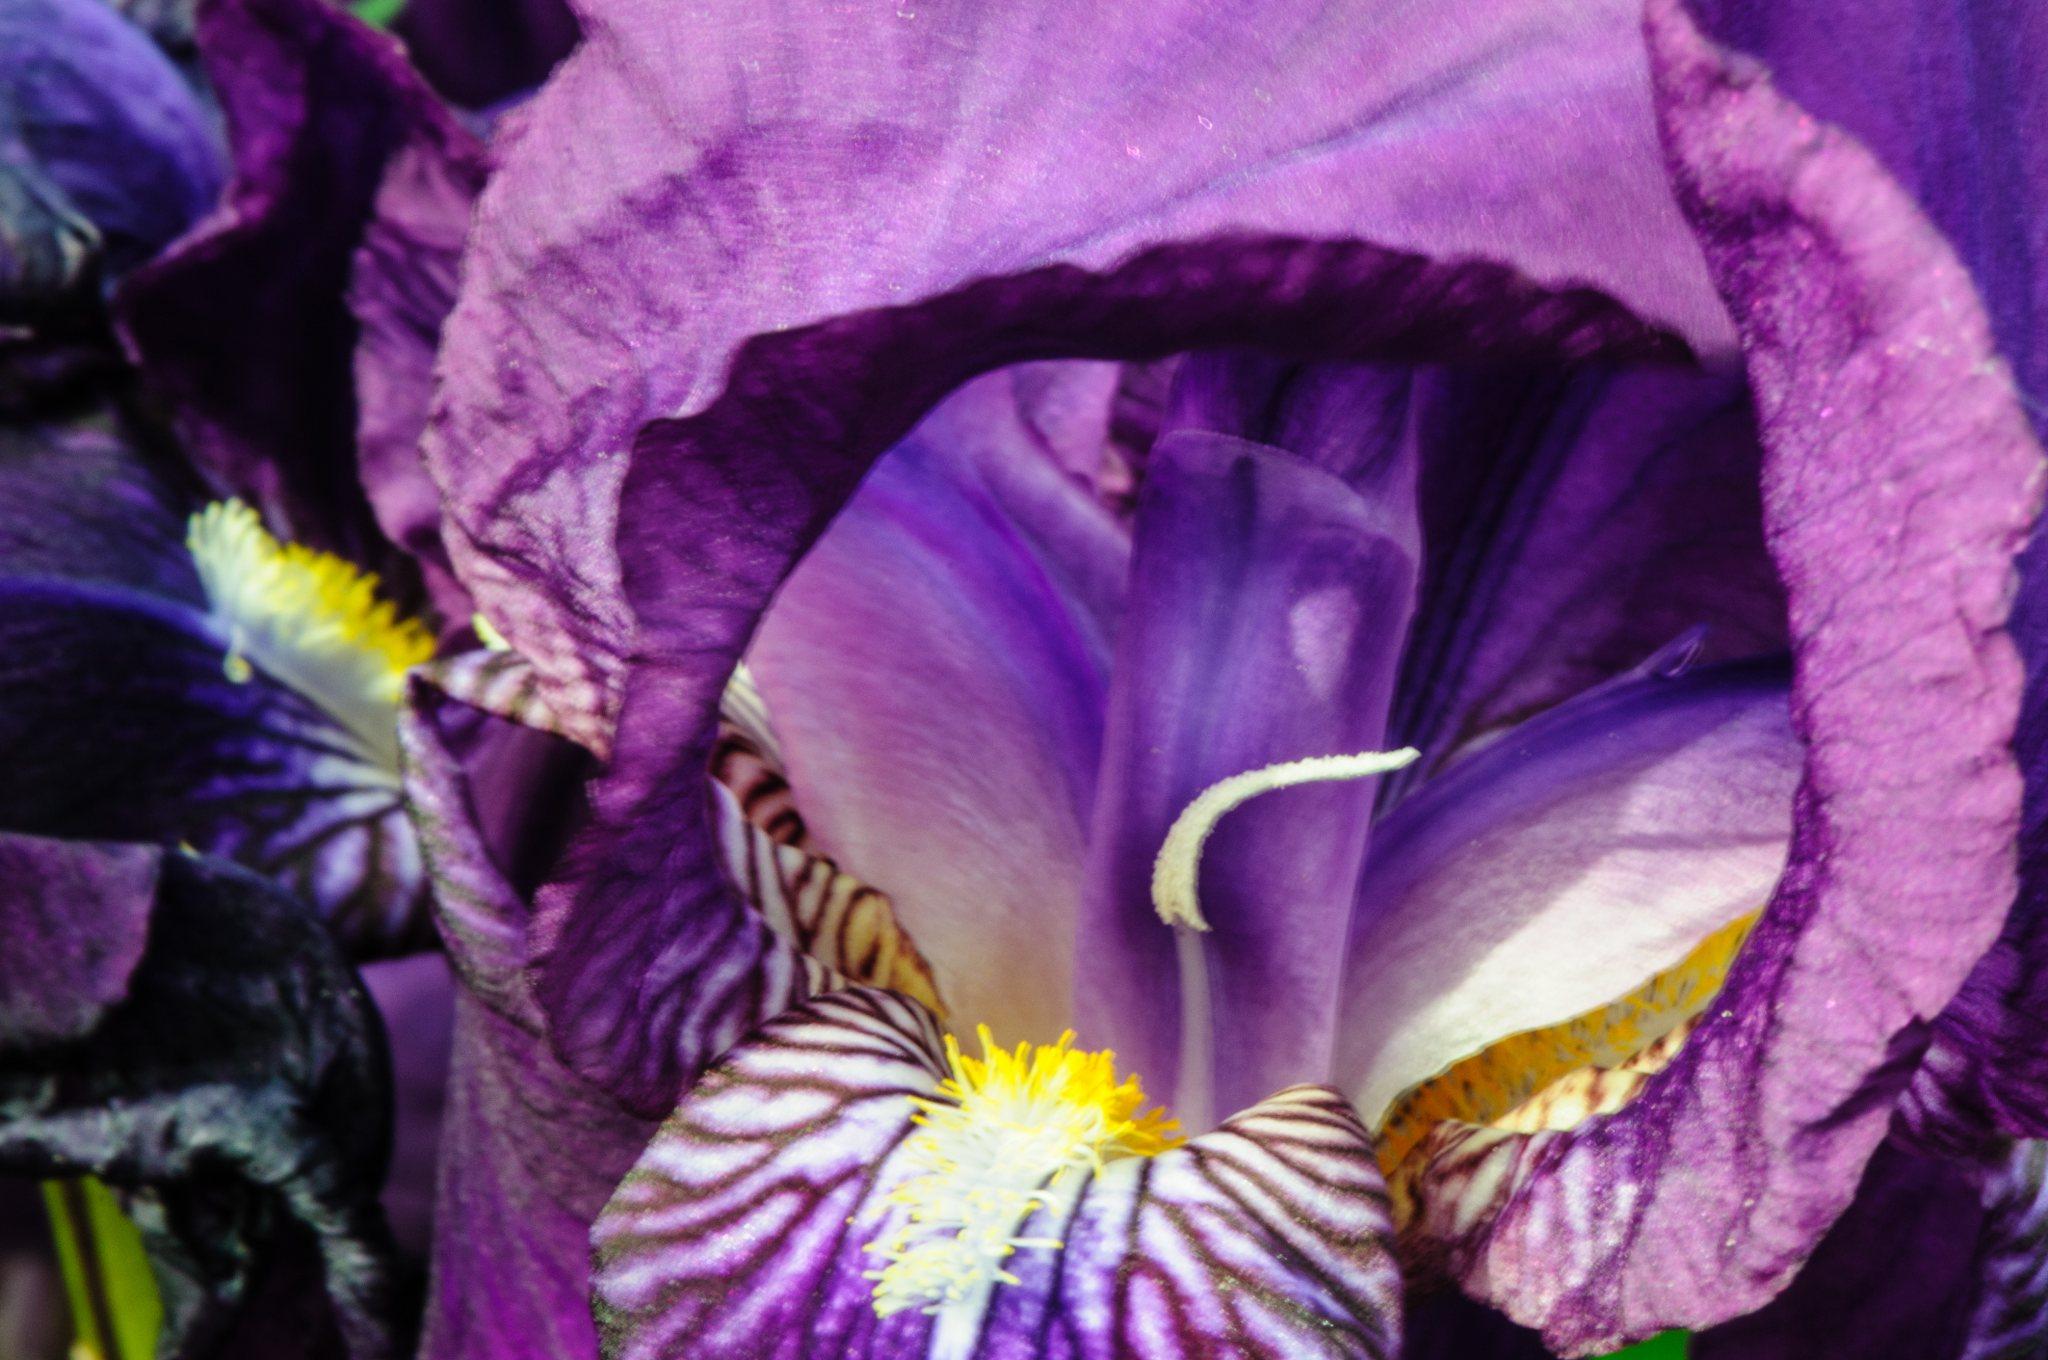 bronces_fleurs-15.jpg